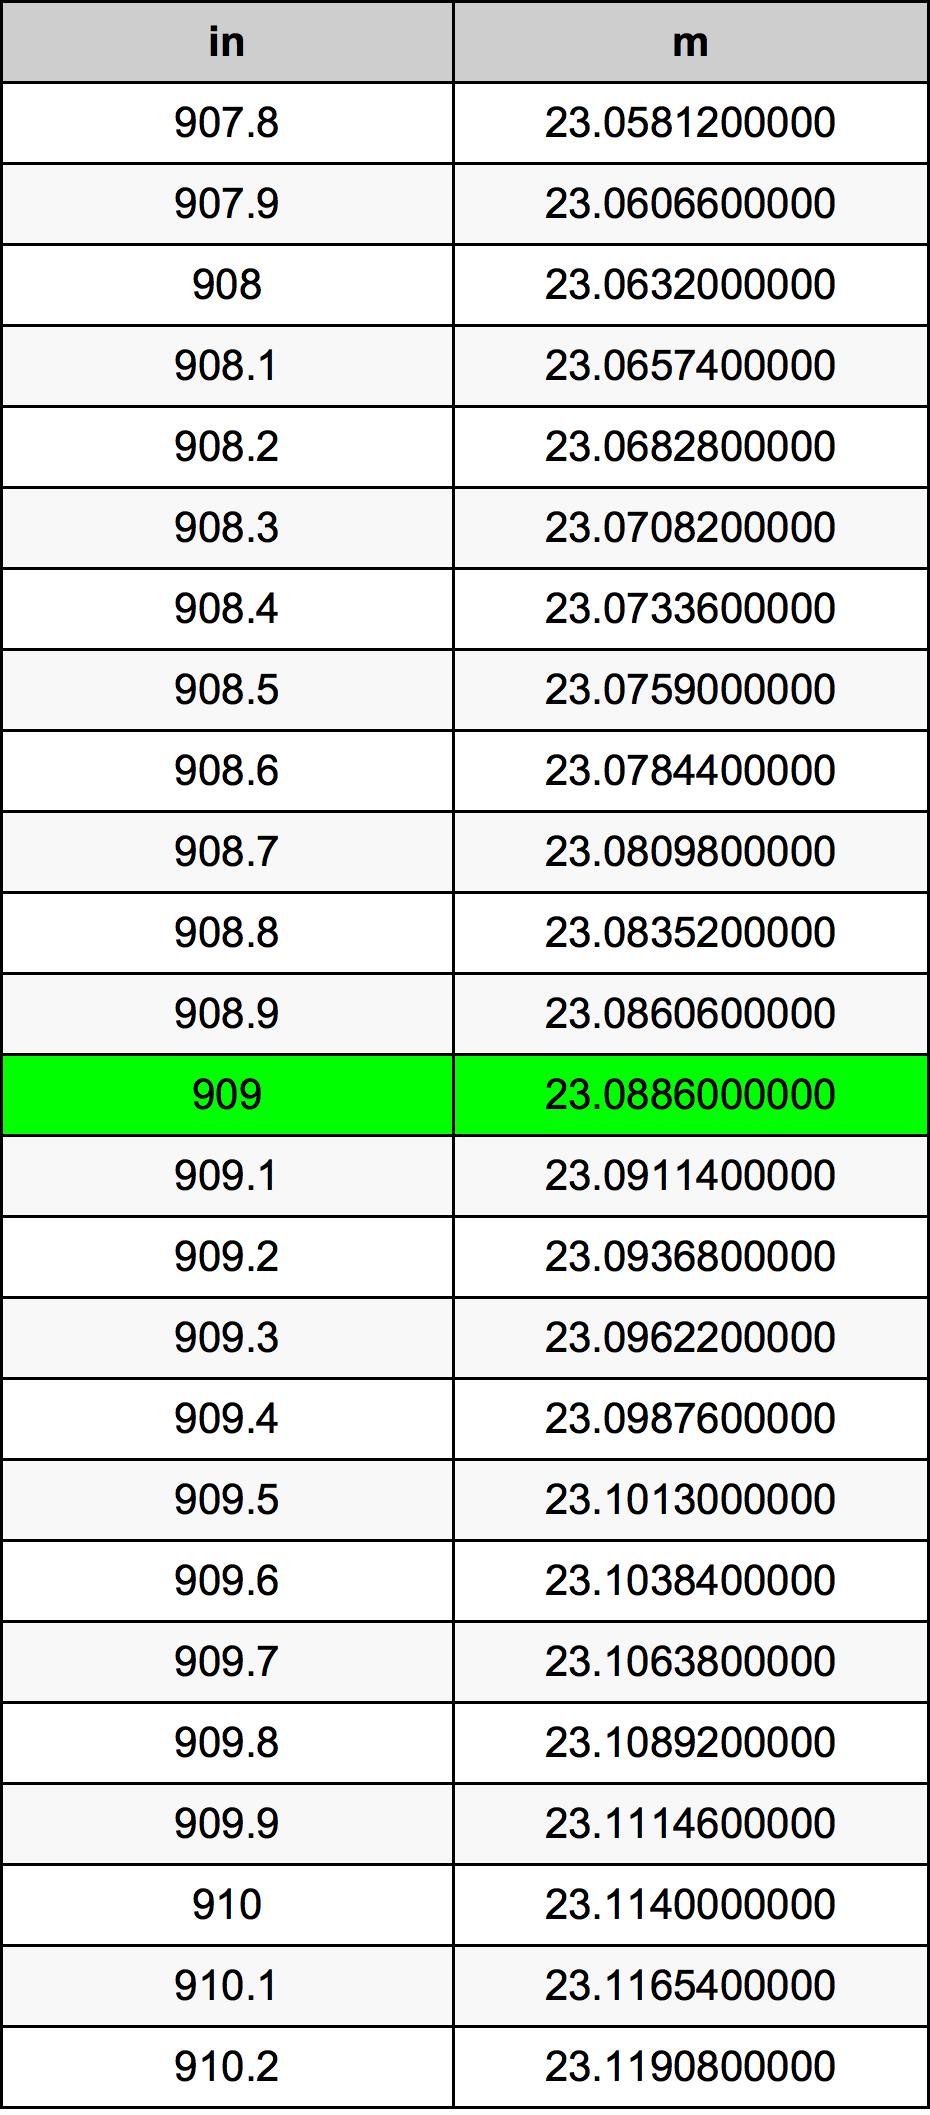 909 Inch konverteringstabell